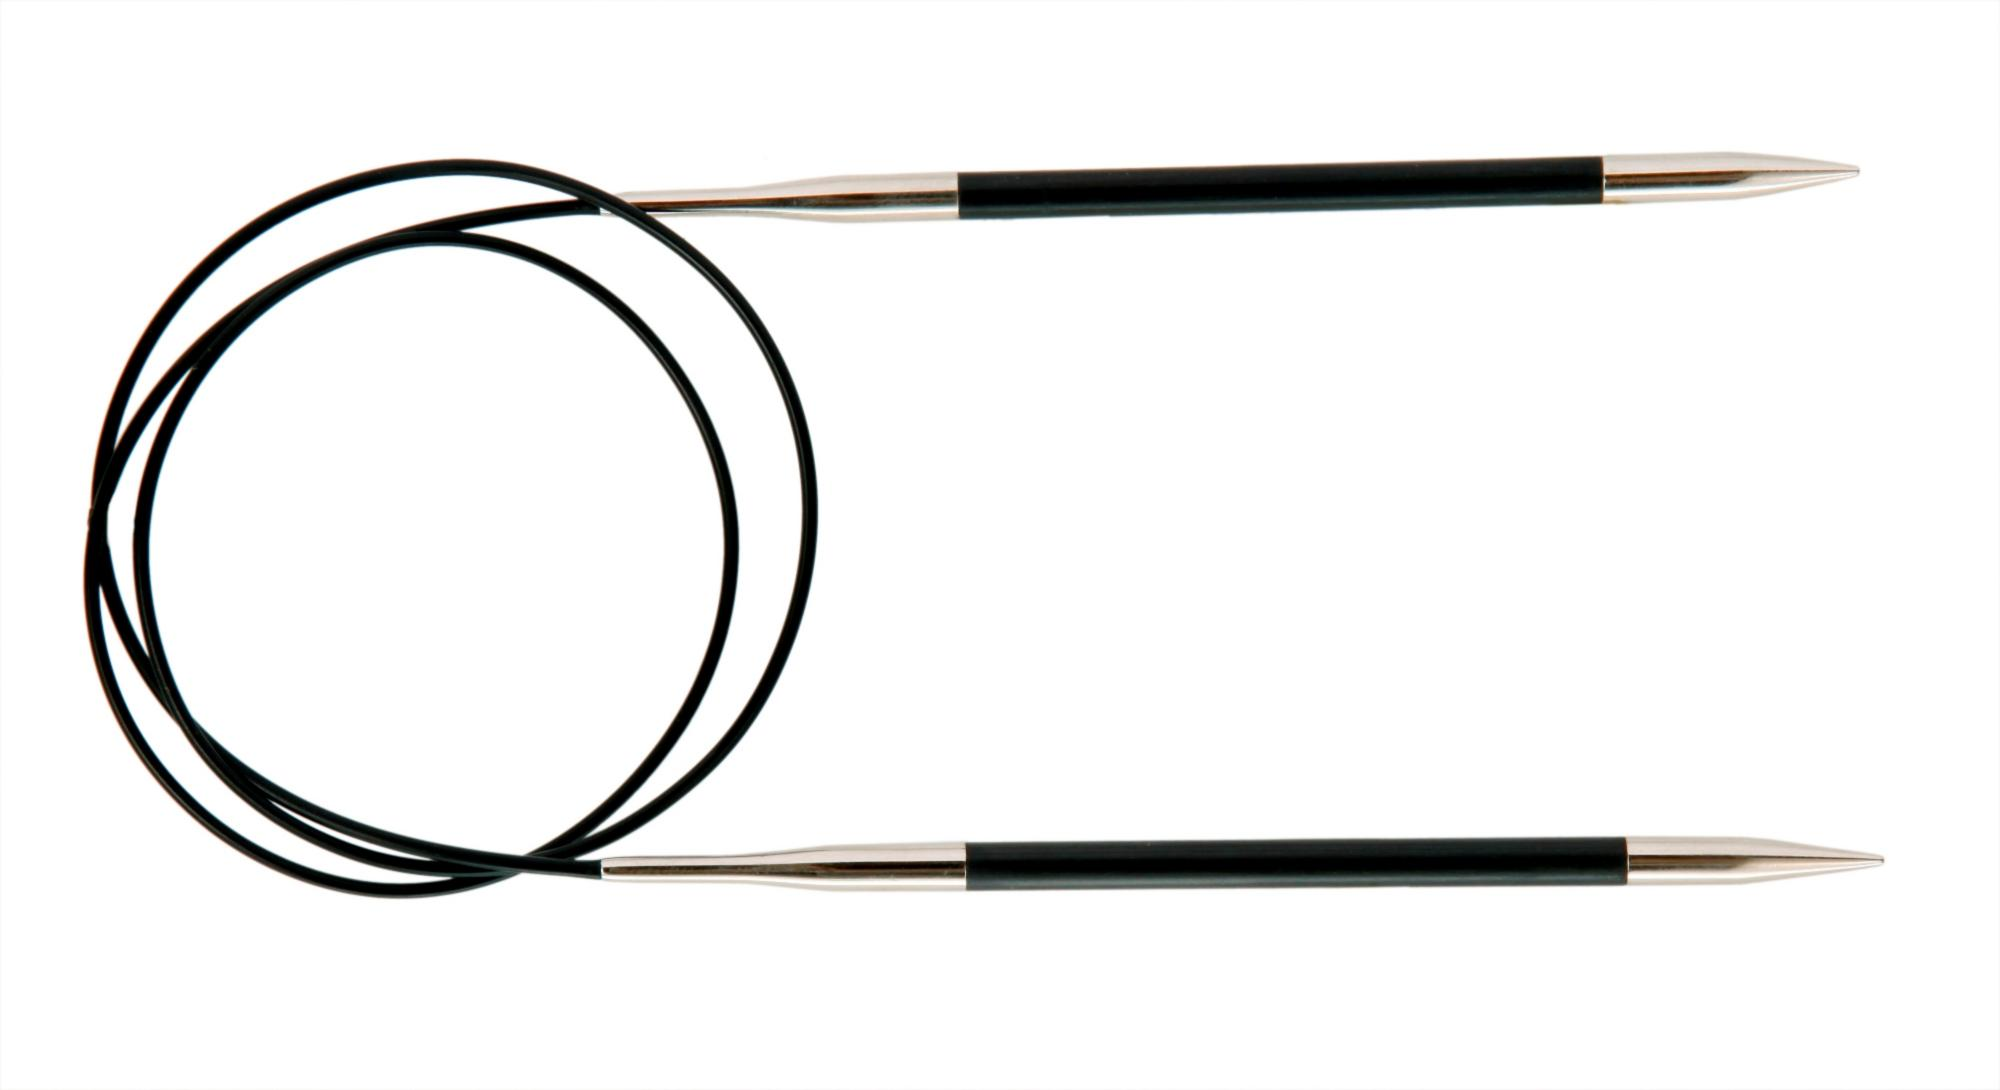 Спицы круговые 100 см Karbonz KnitPro, 41212, 5.50 мм